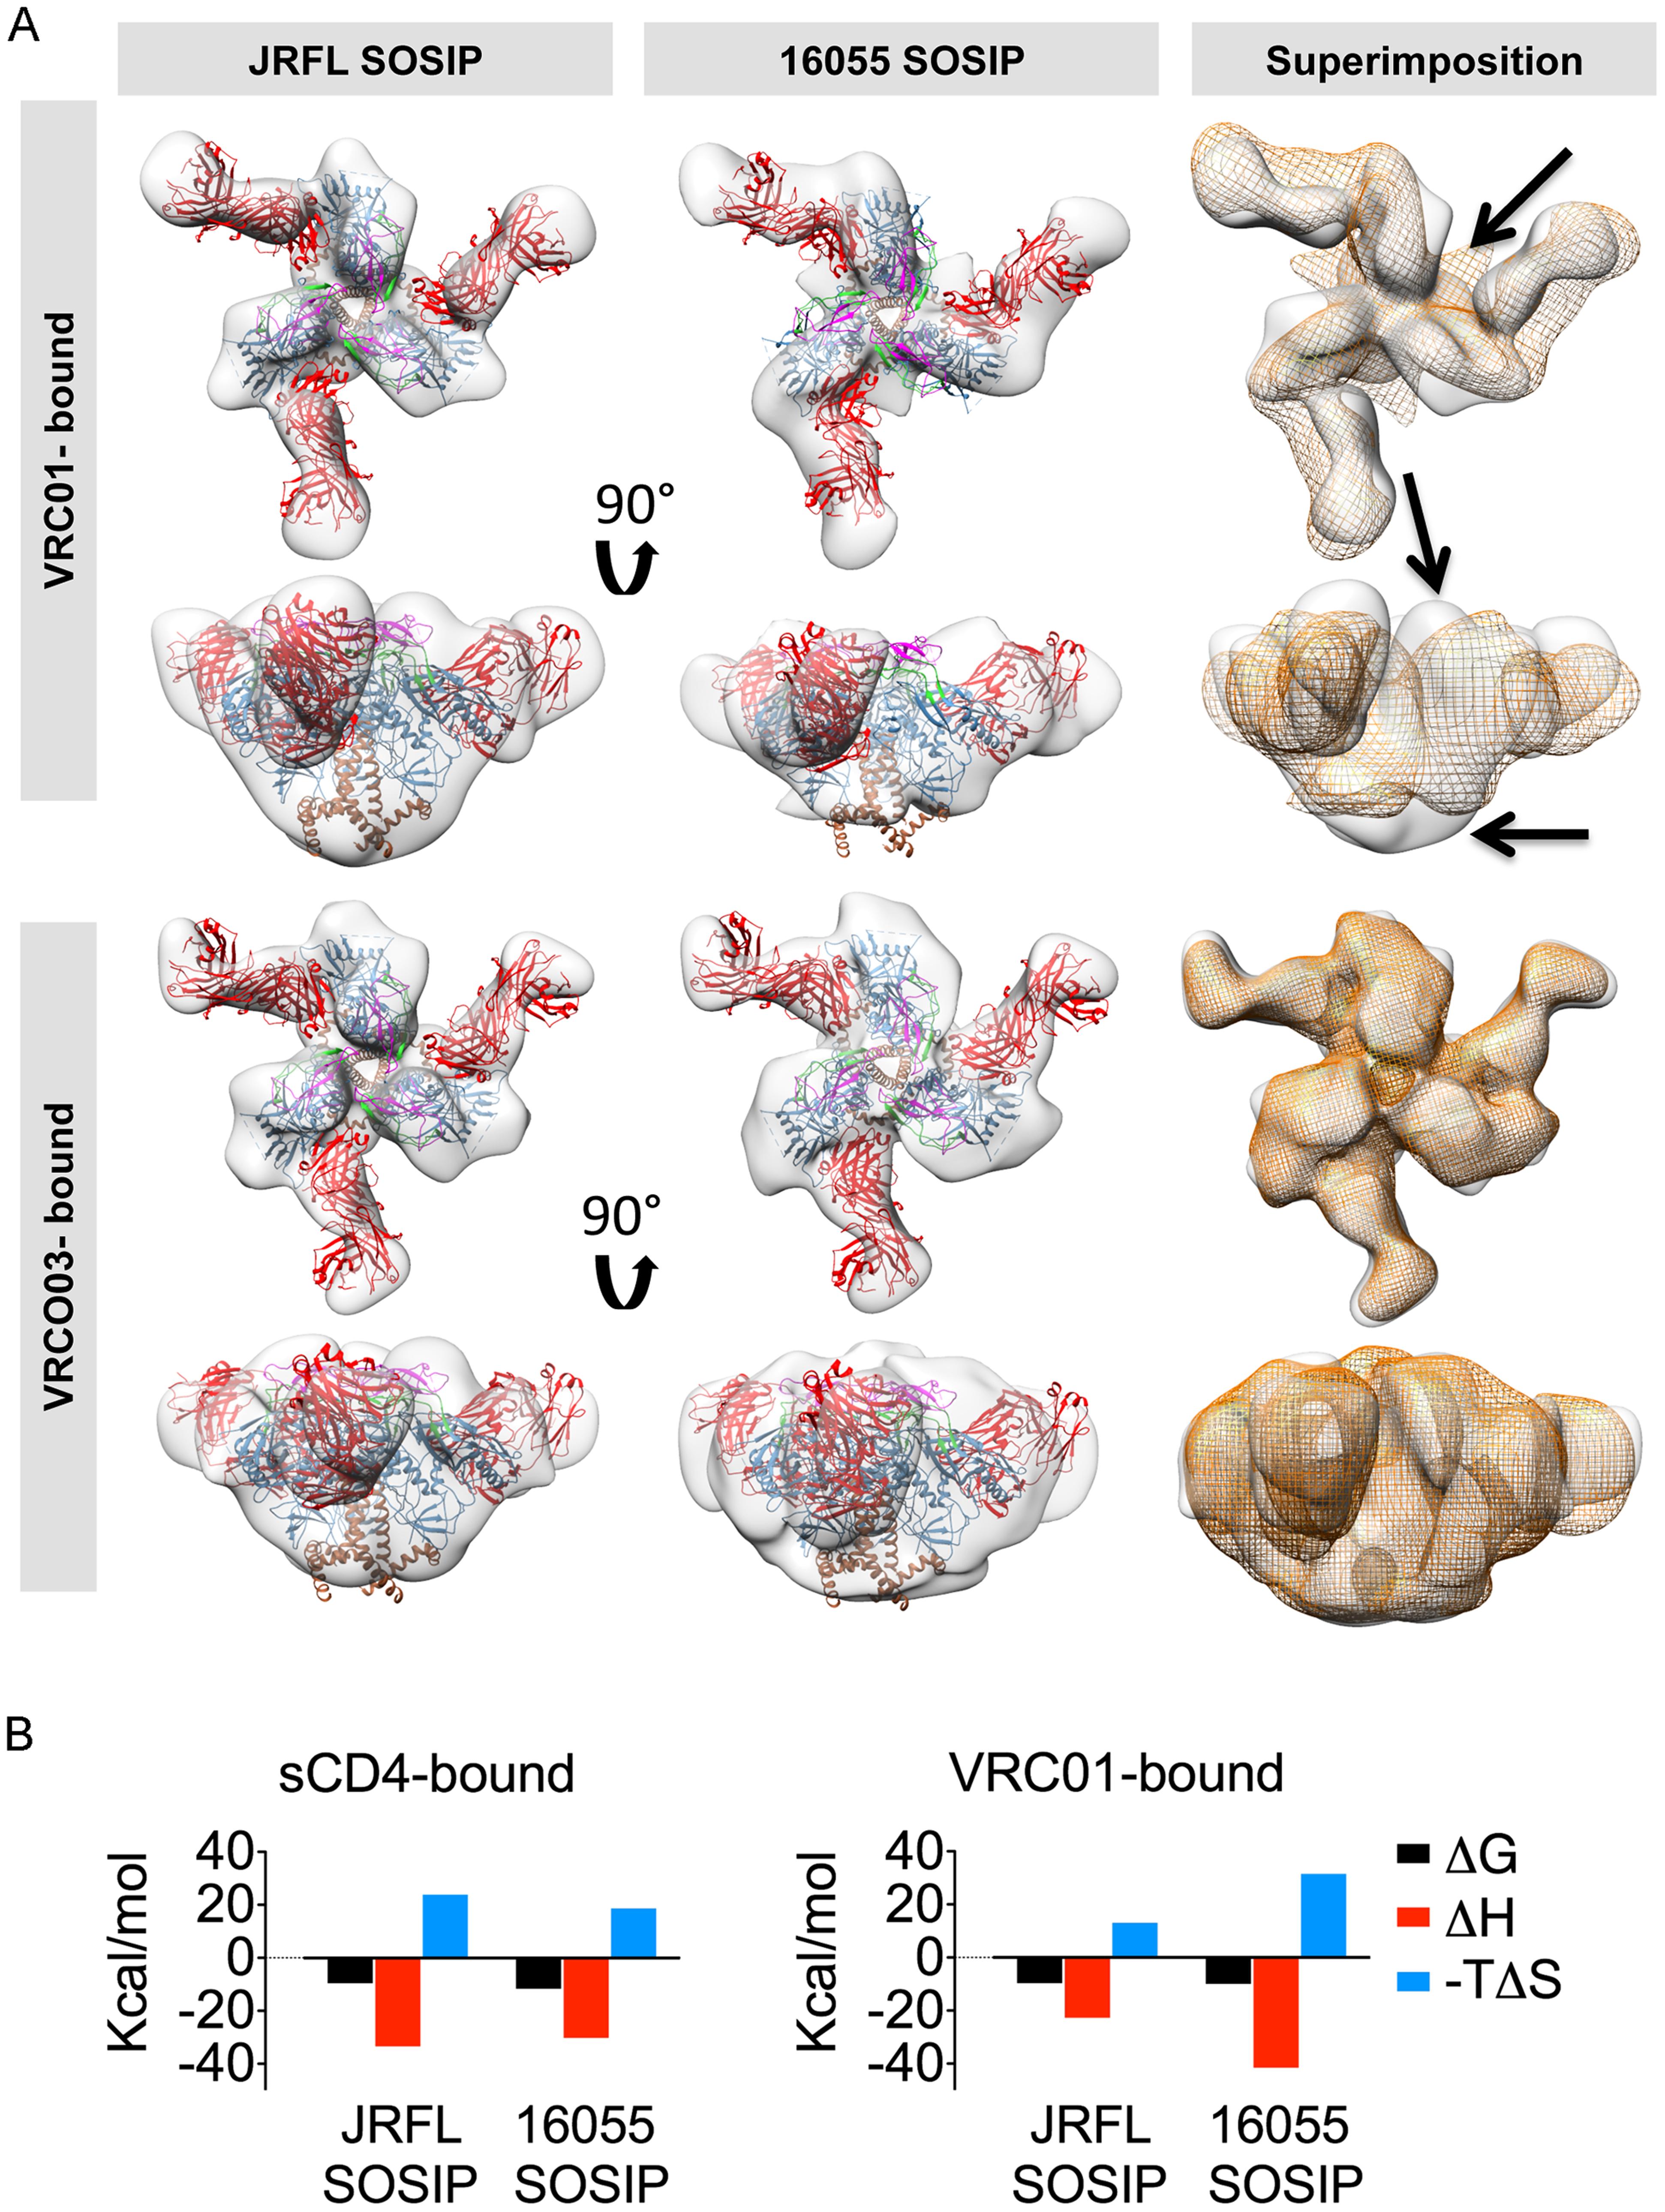 EM 3D reconstructions of VRC01- and VRC03-liganded SOSIP trimers.